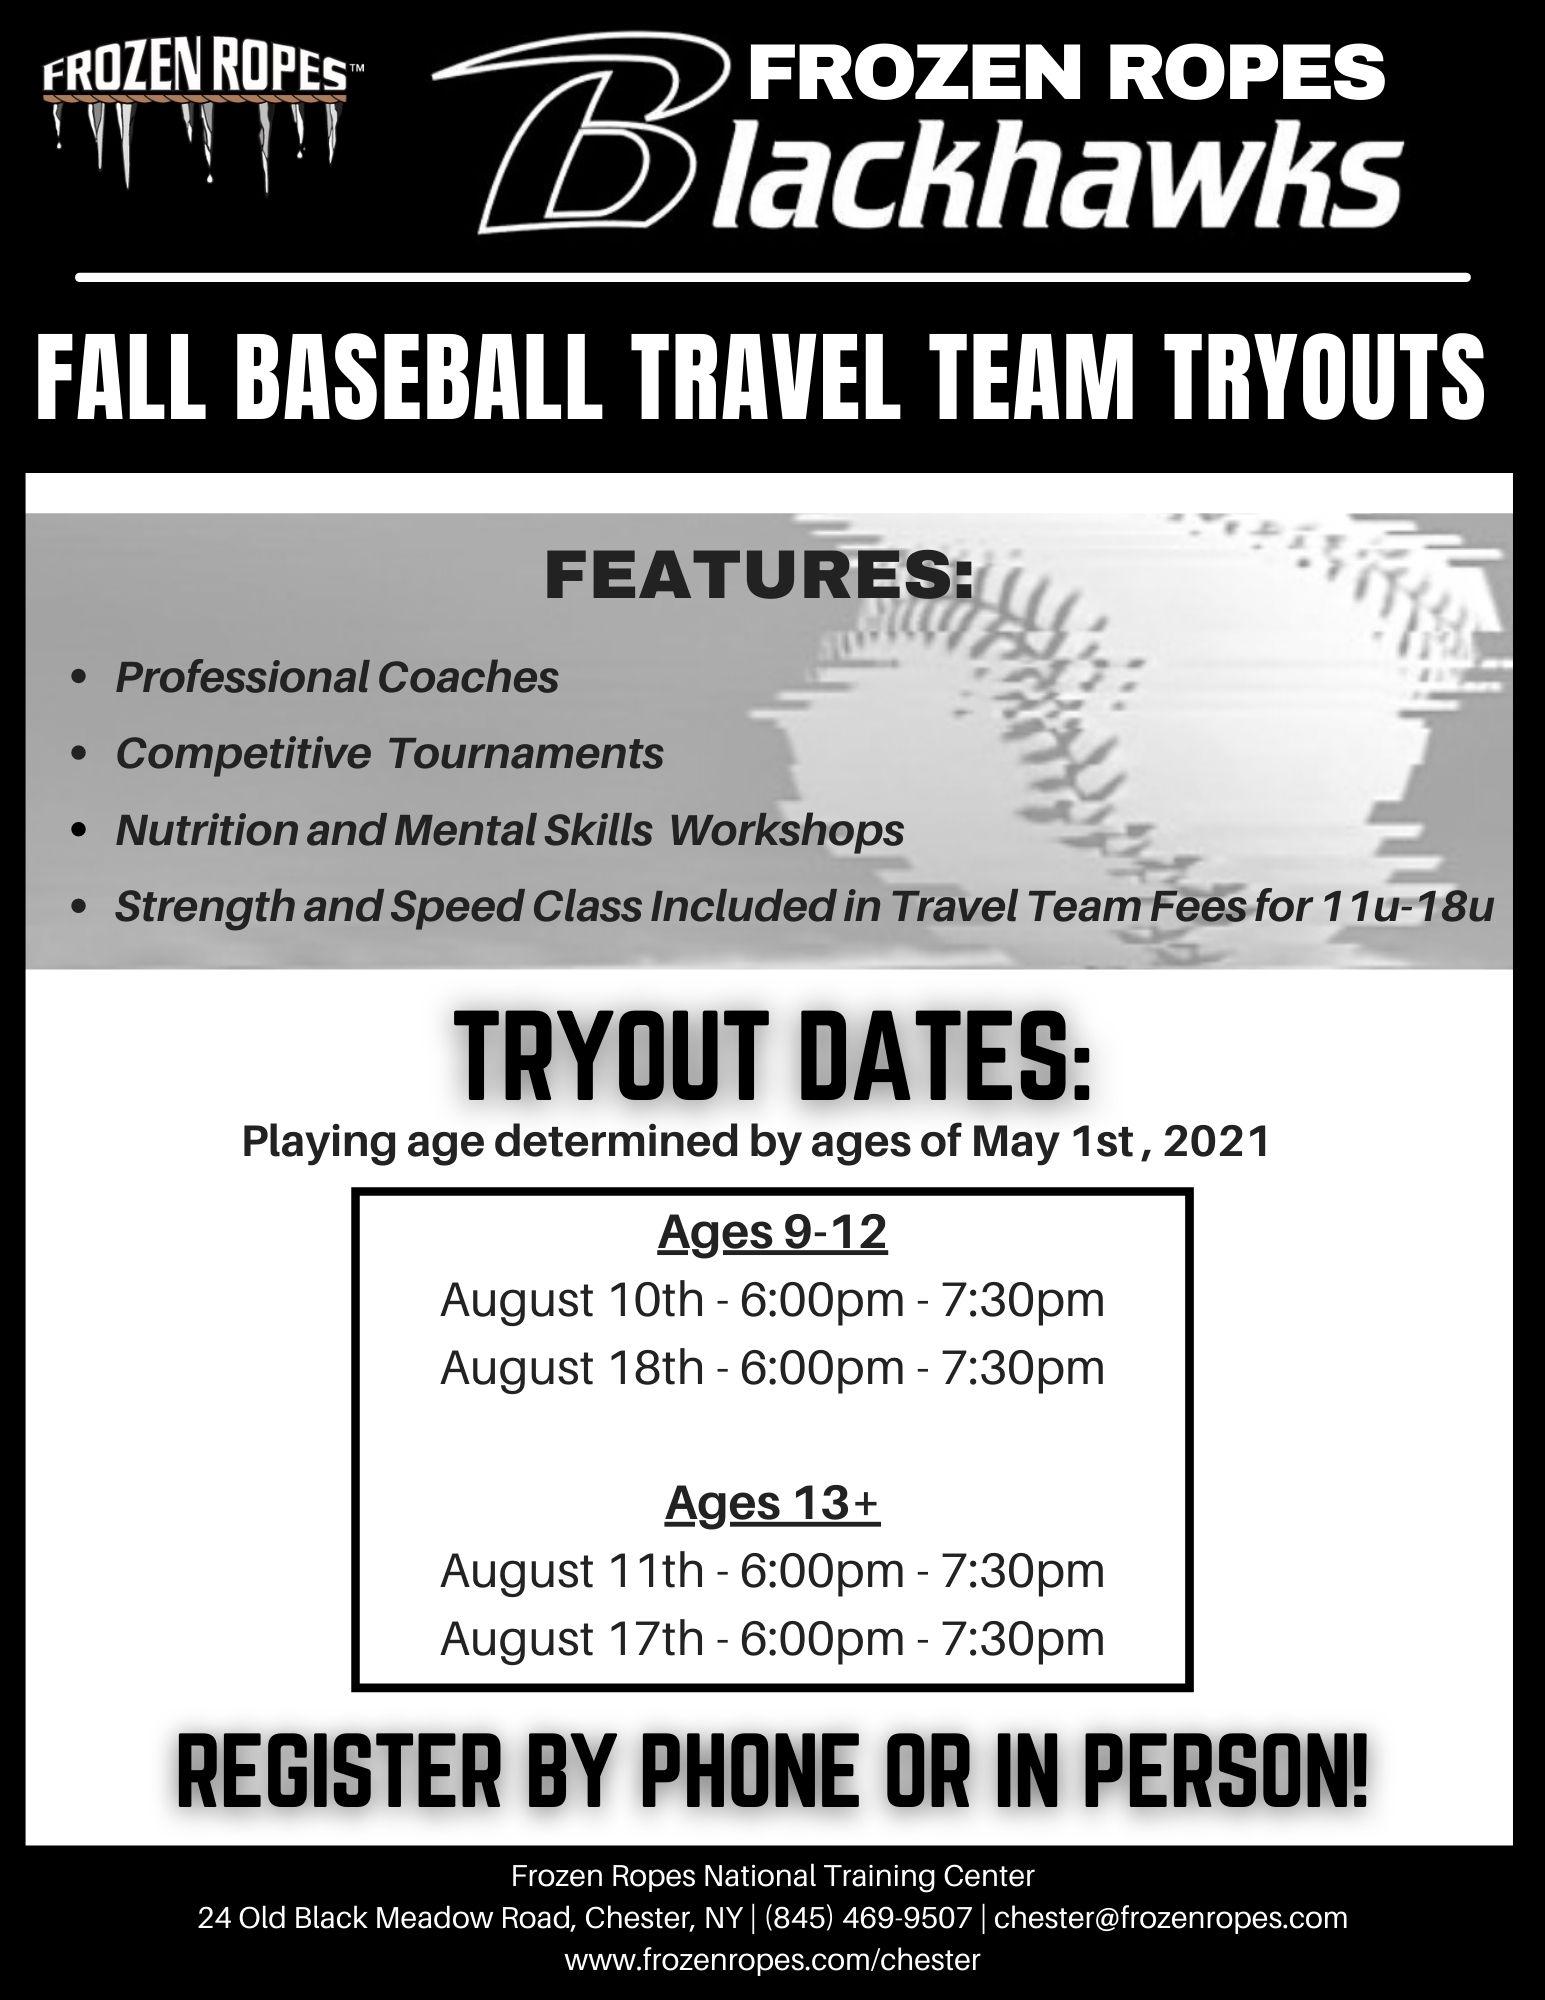 Frozen Ropes baseball tryouts for Fall 2021 season